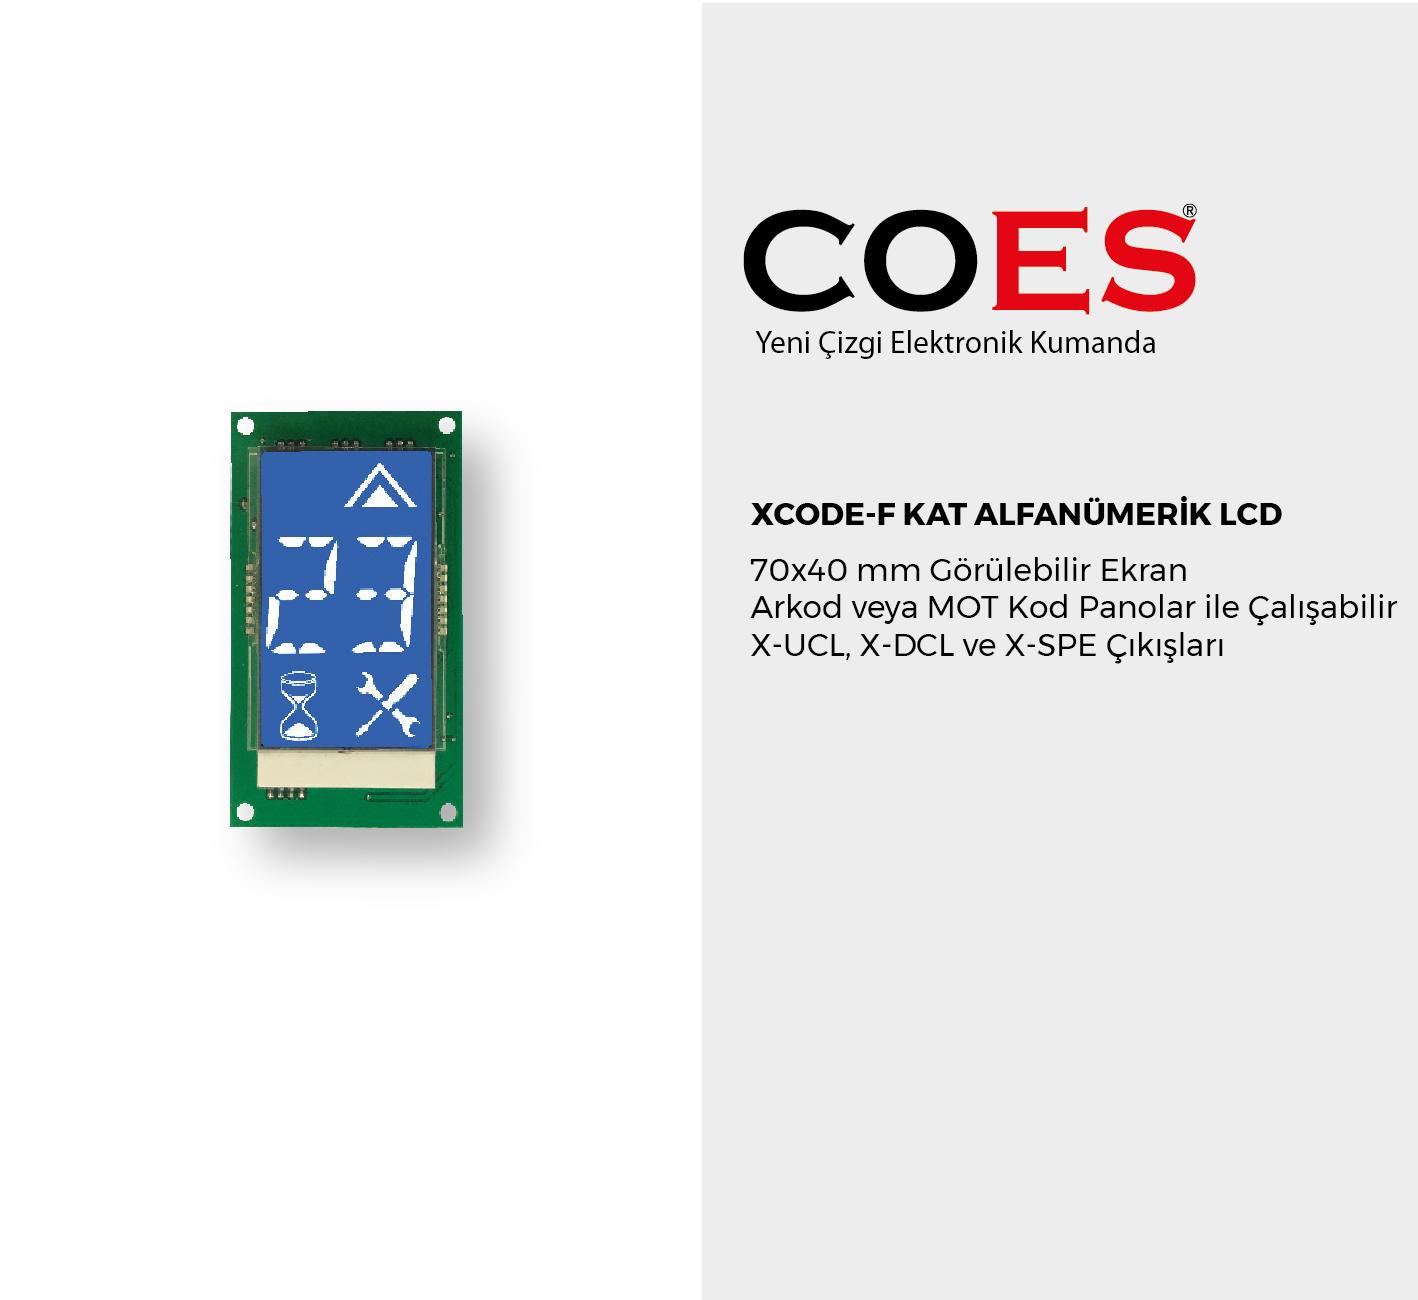 XCODE-F KAT ALFANÜMERİK LCD